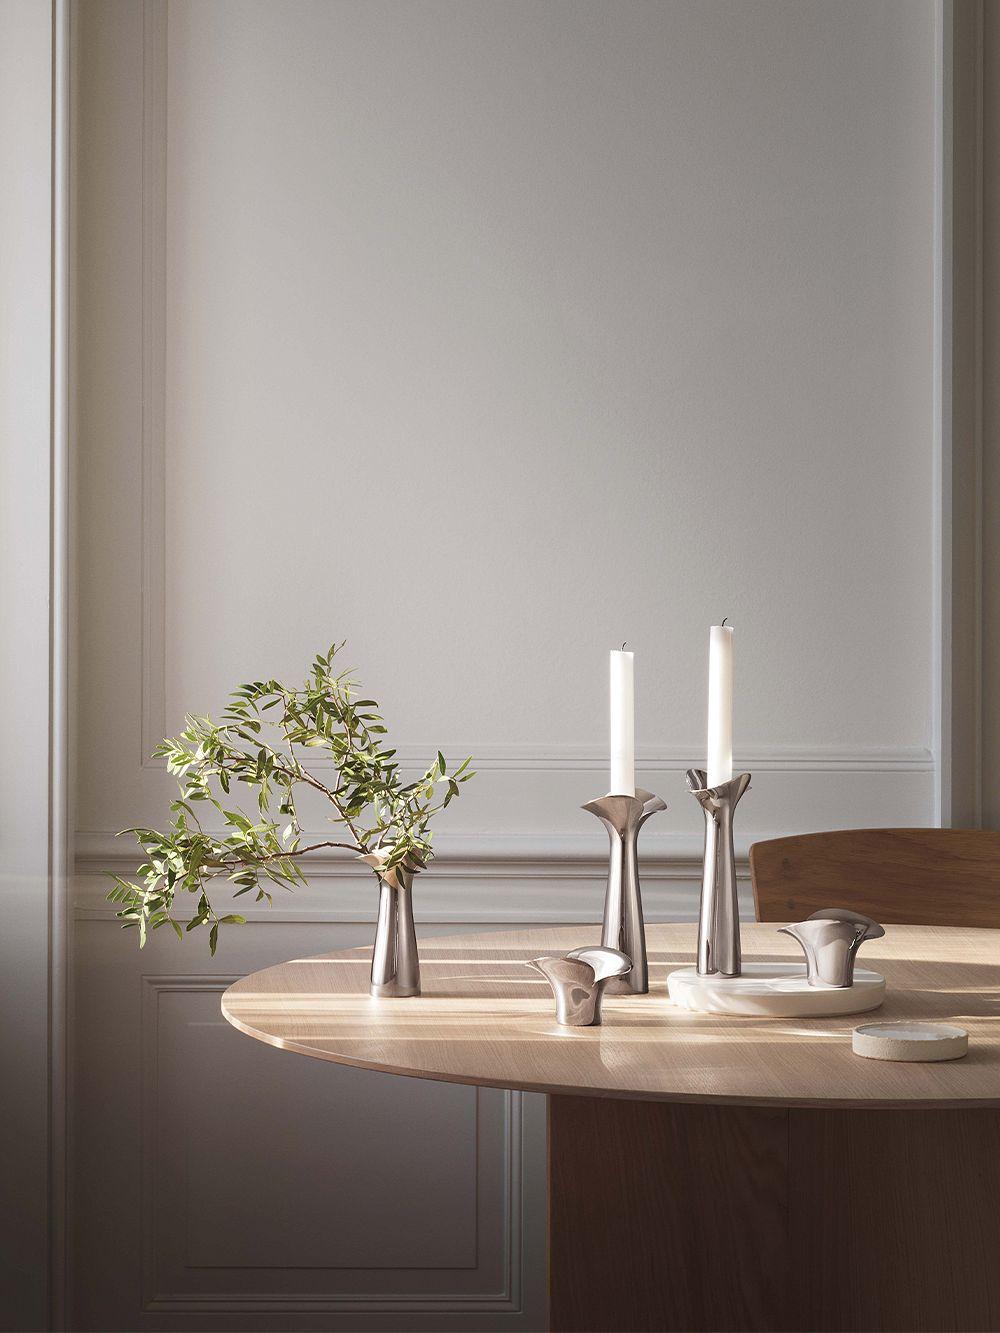 Georg Jensen Botanica candleholders